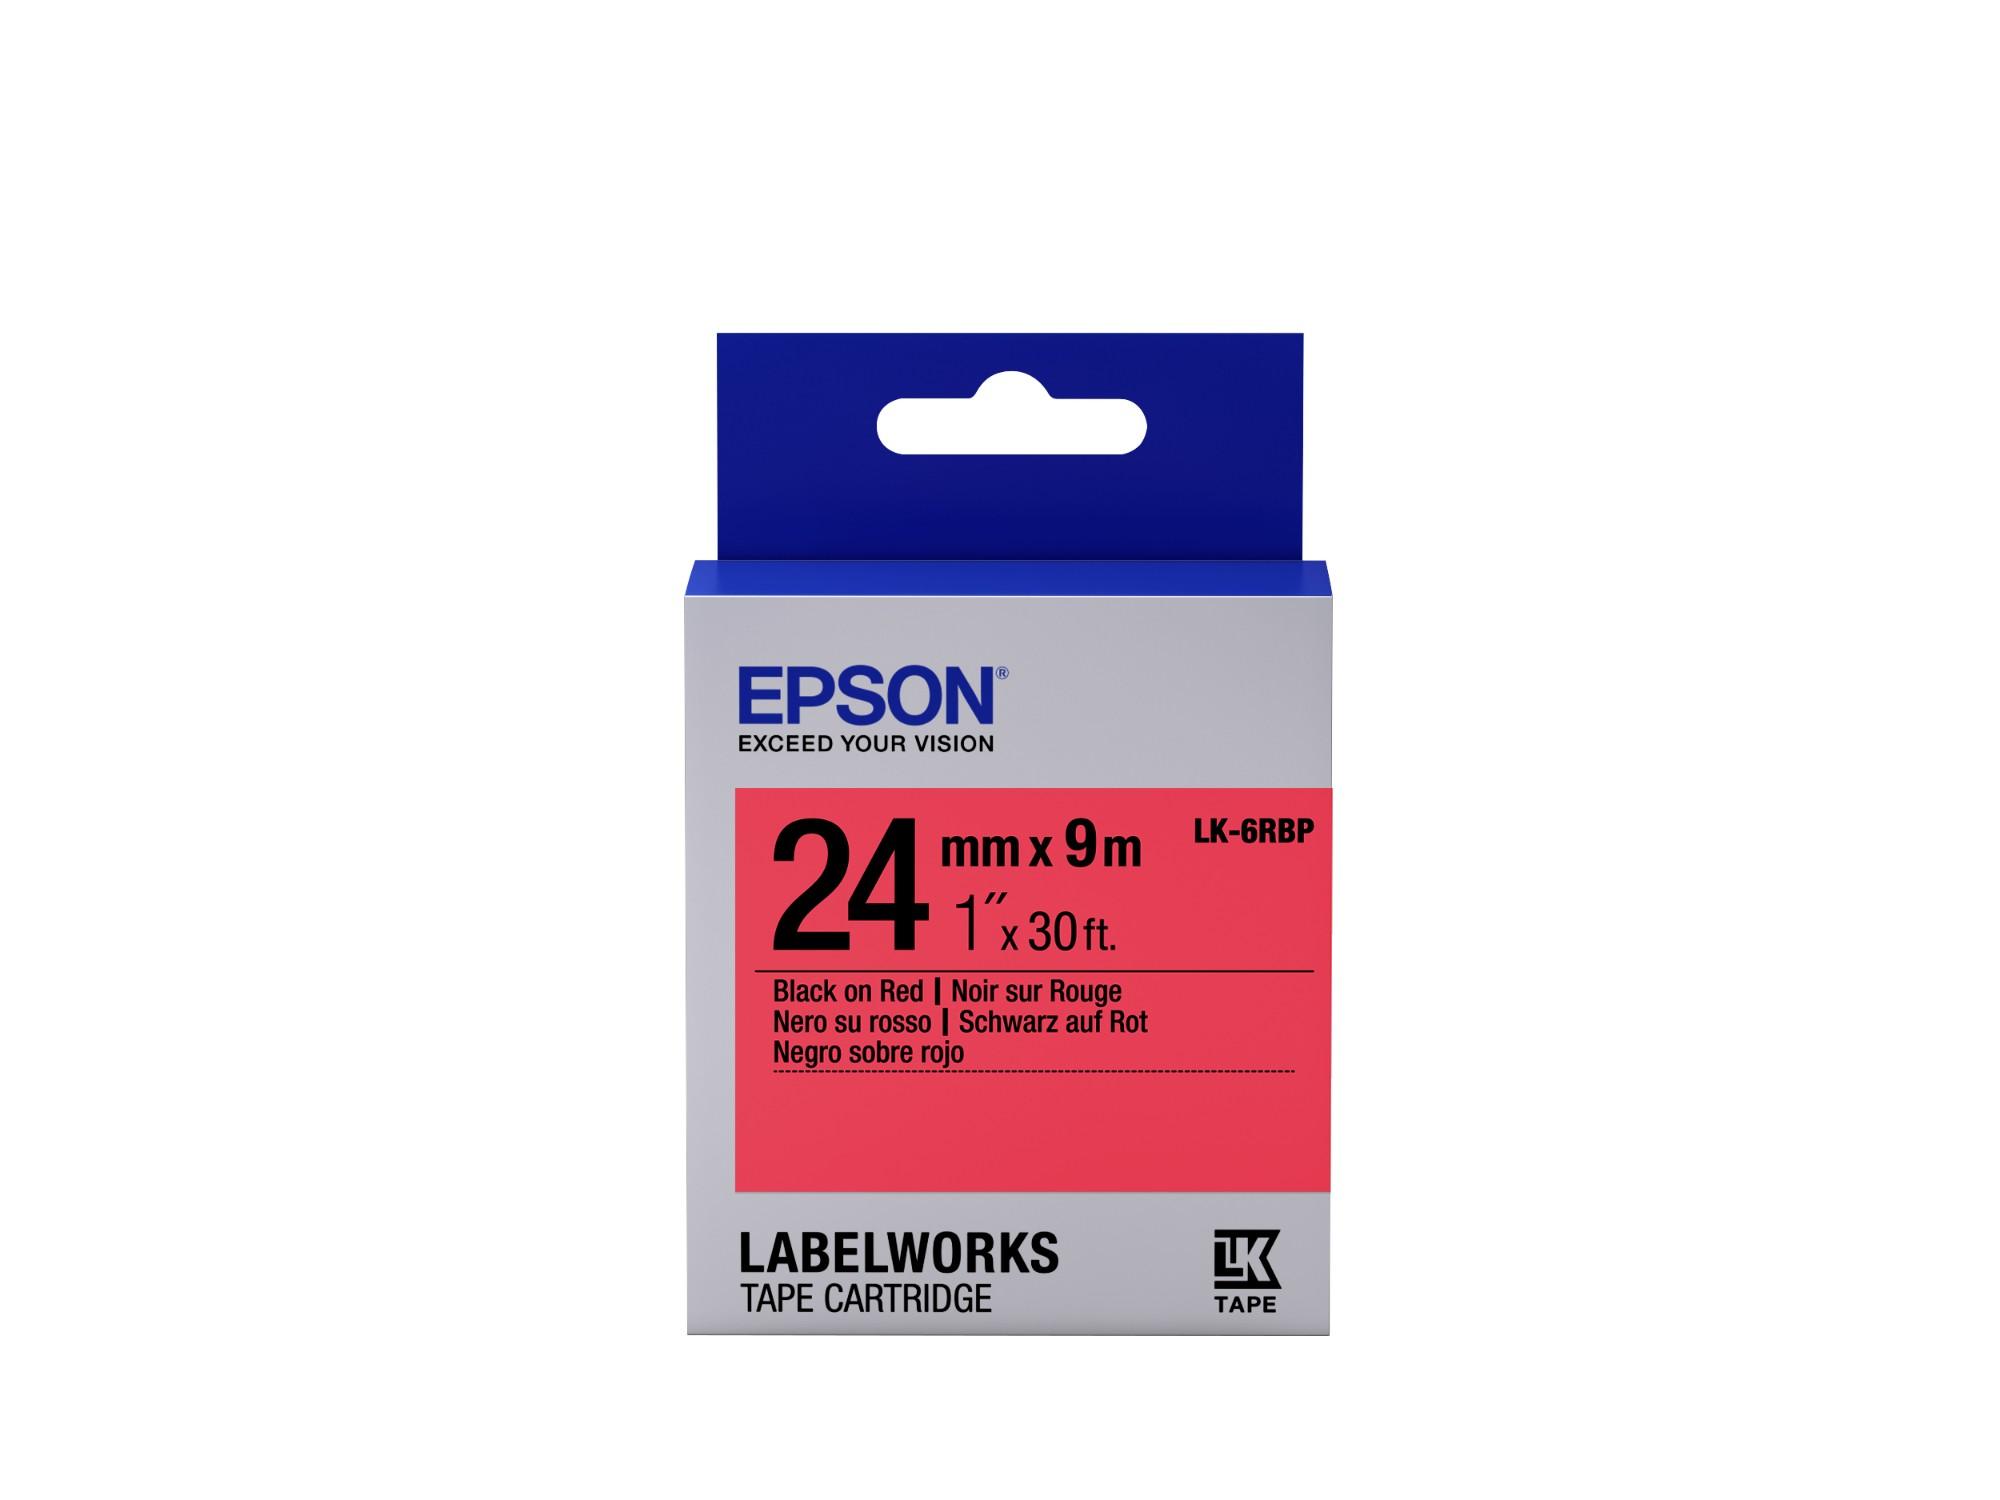 Epson Pastel Tape- LK-6RBP Pastel Blk/Red 24/9